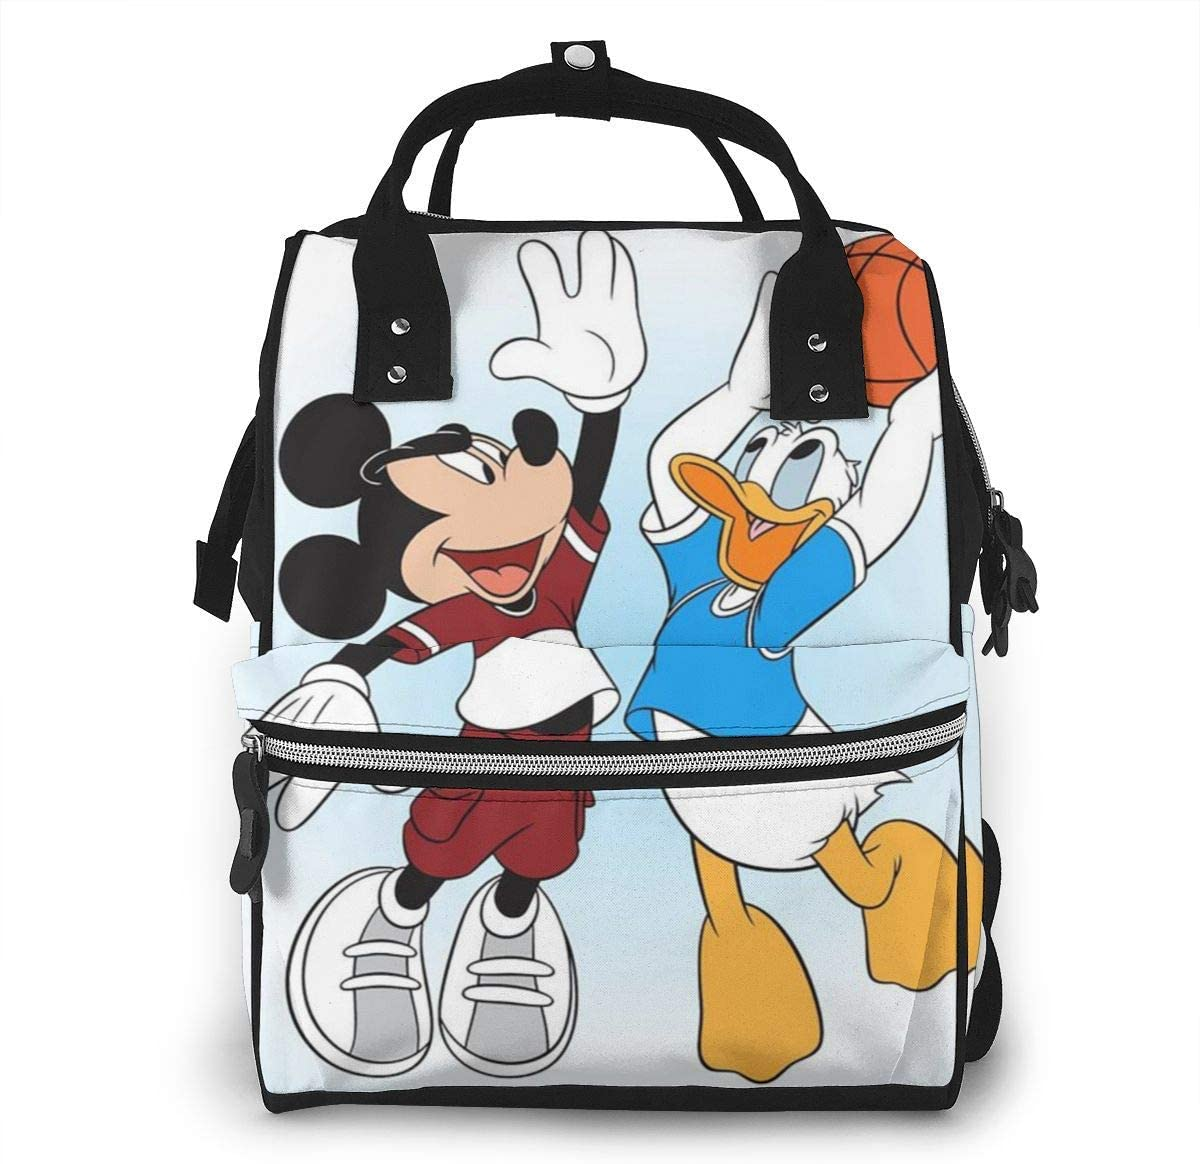 Mochila para pañales - Mickey Mouse y Donald Duck Mochila ...